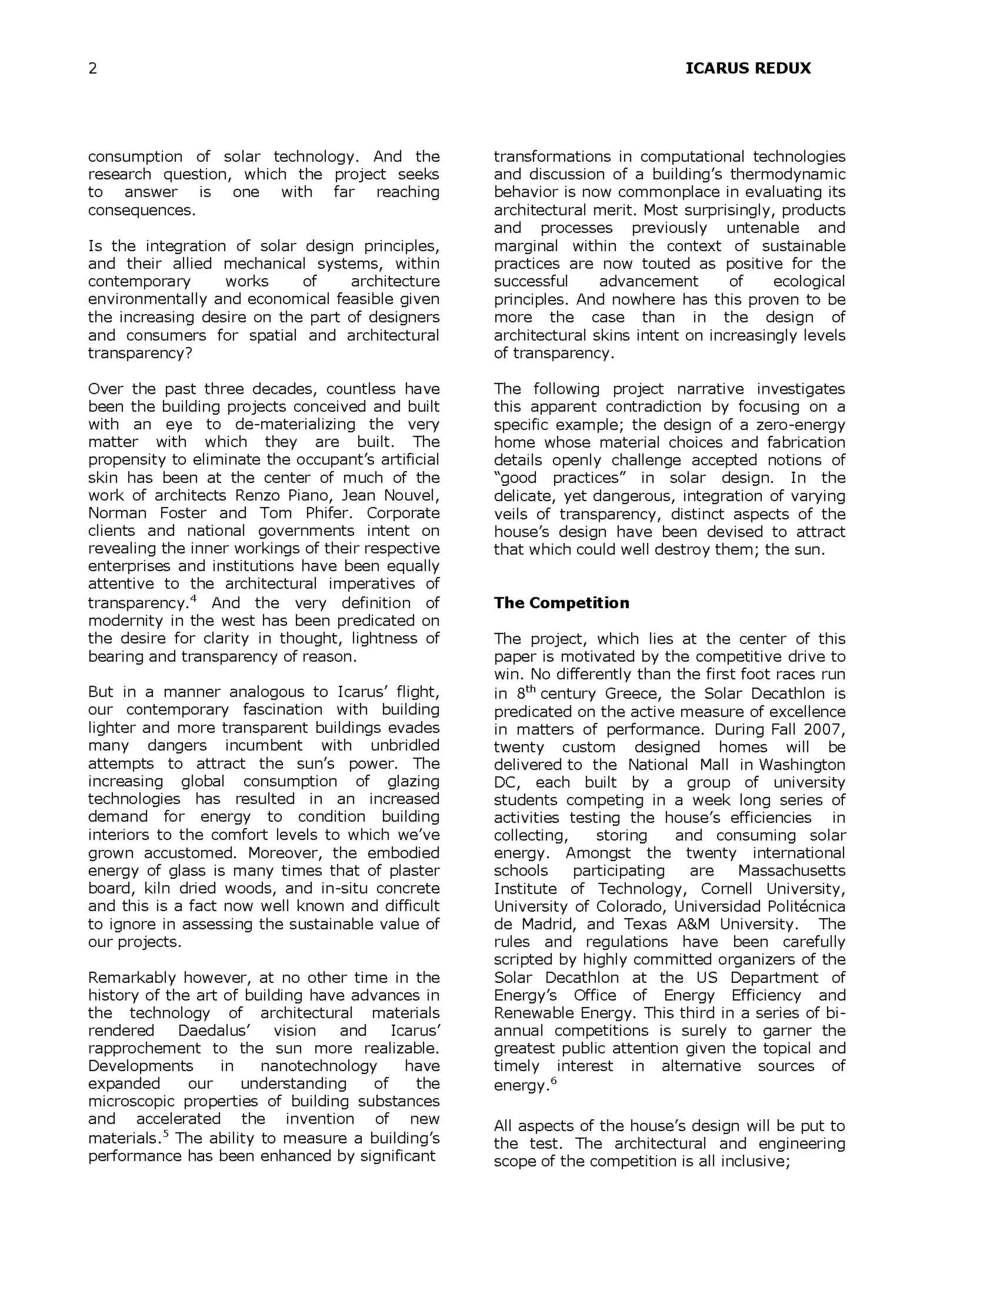 ACSA.2007.IcarusRedux2_Page_2.jpg